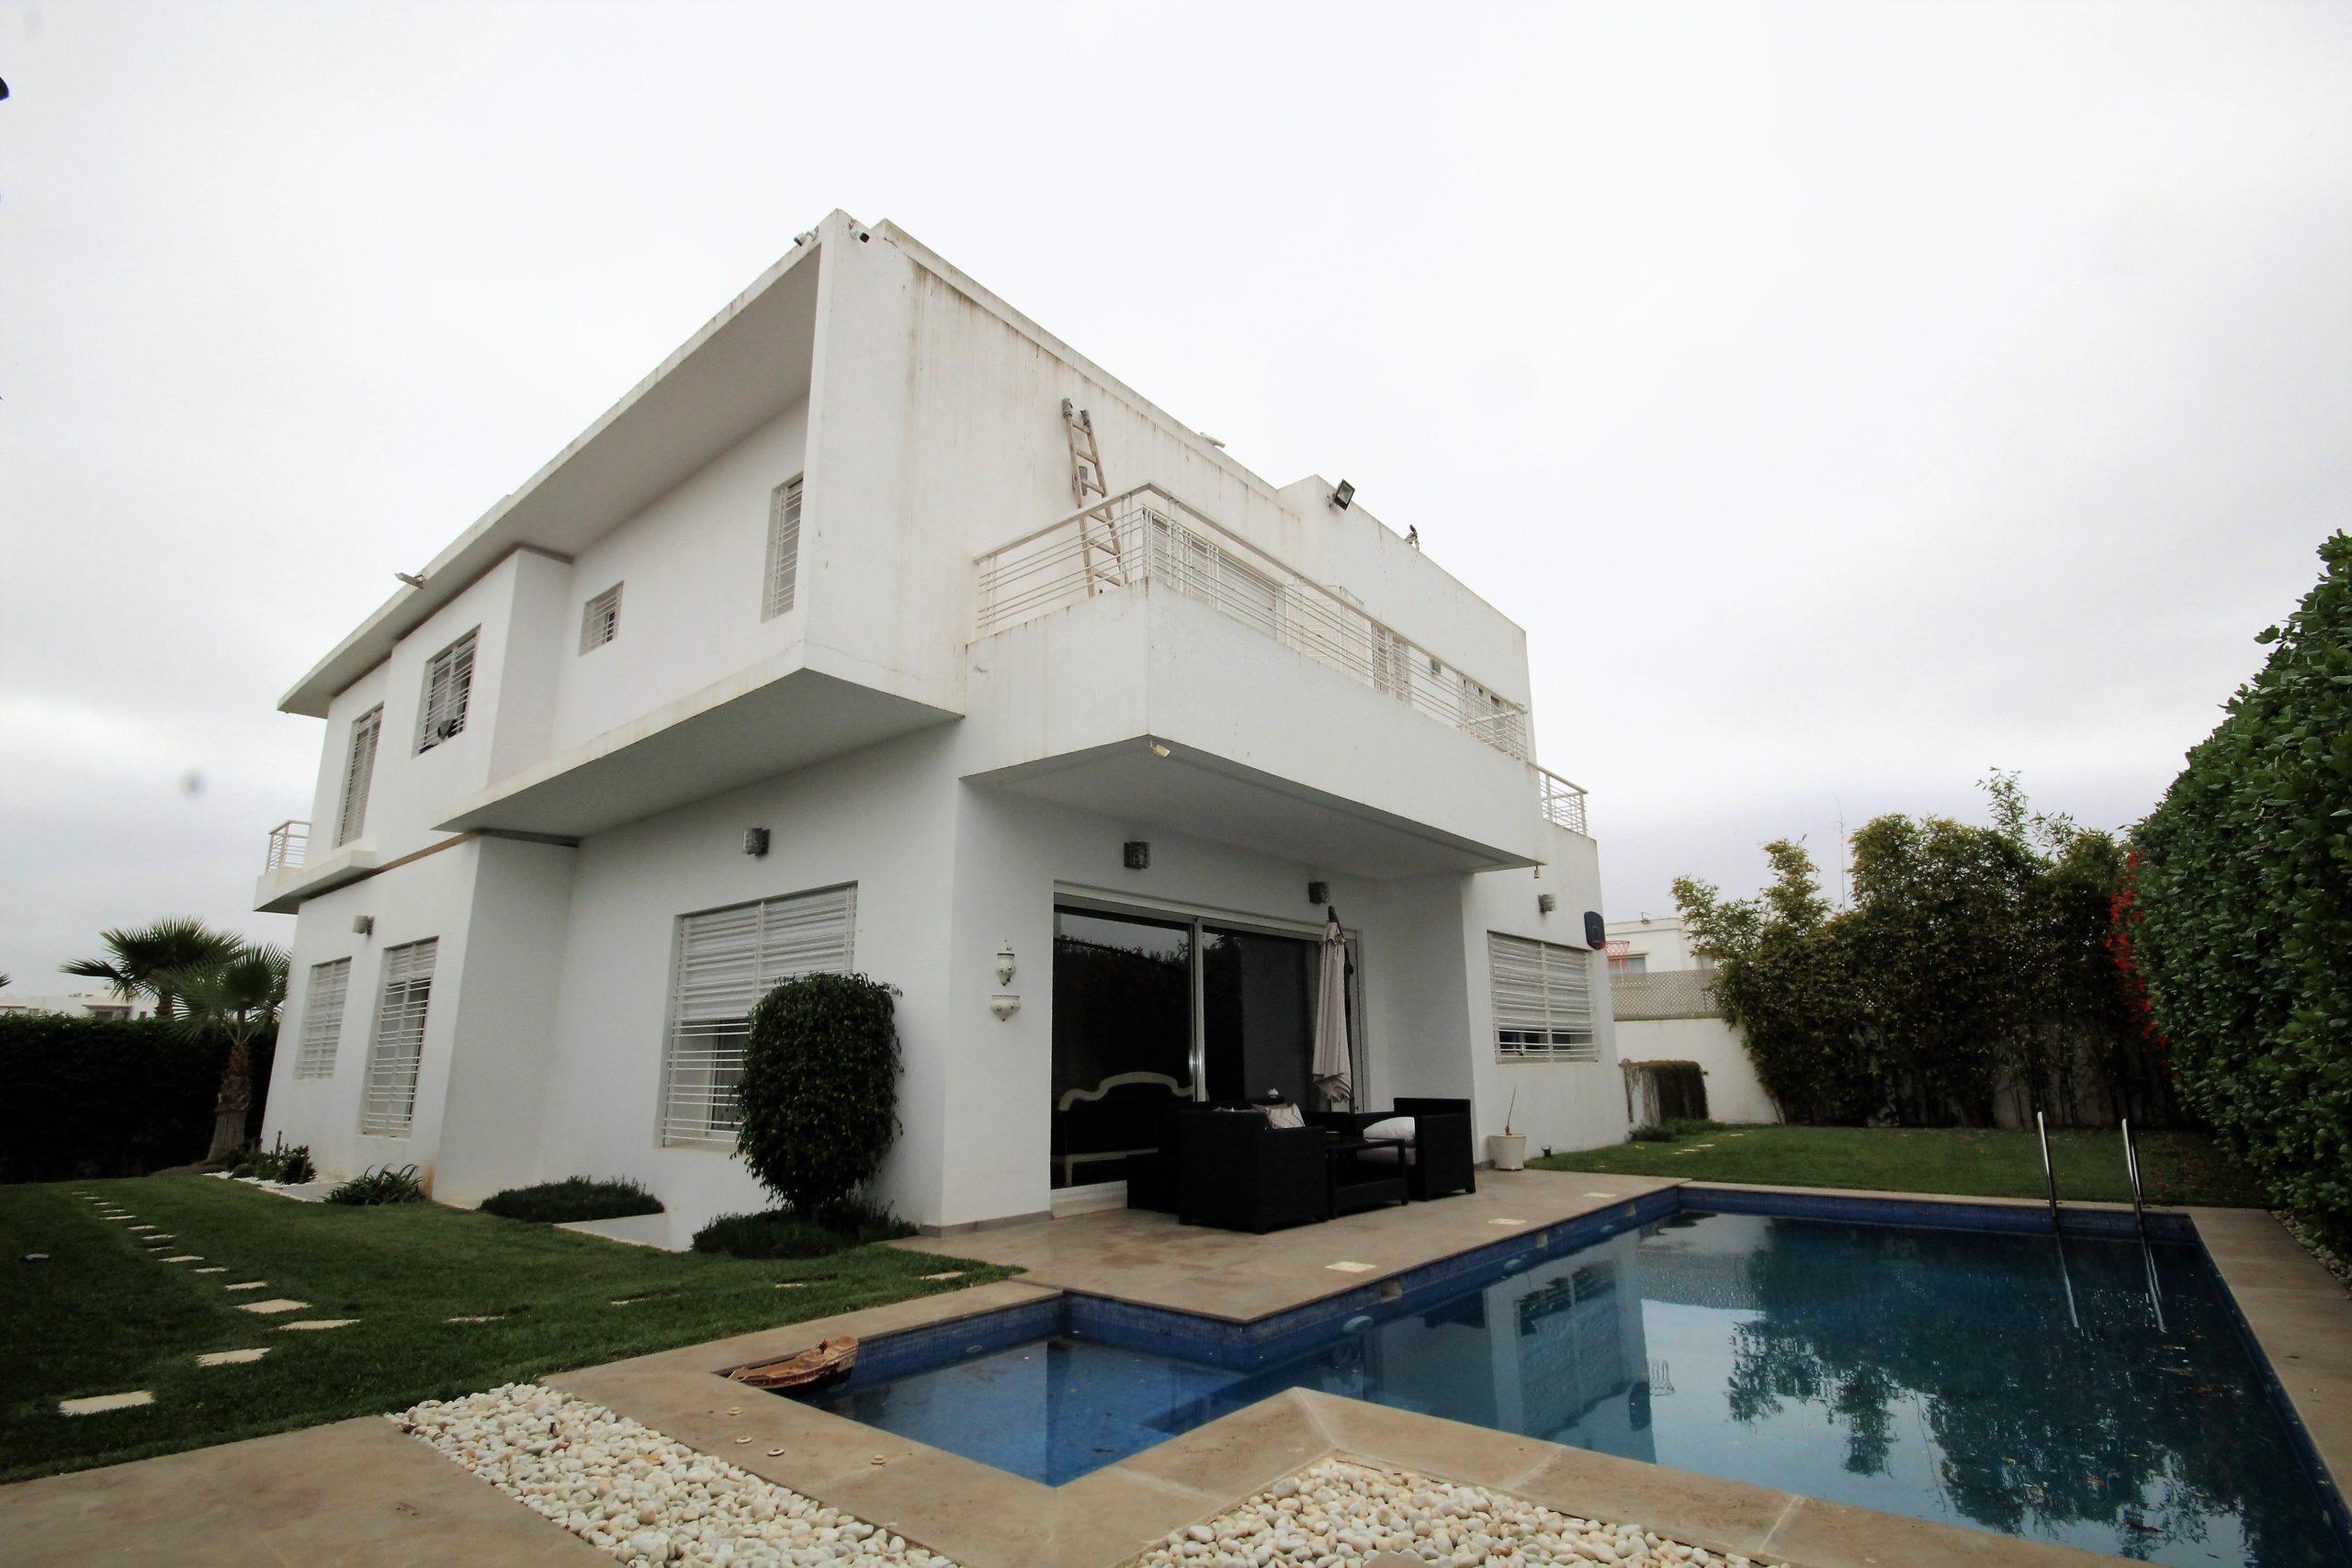 Maroc, Bouskoura village, vente de Villa individuelle moderne de 5 suites à 5 mn de Sidi Maarouf